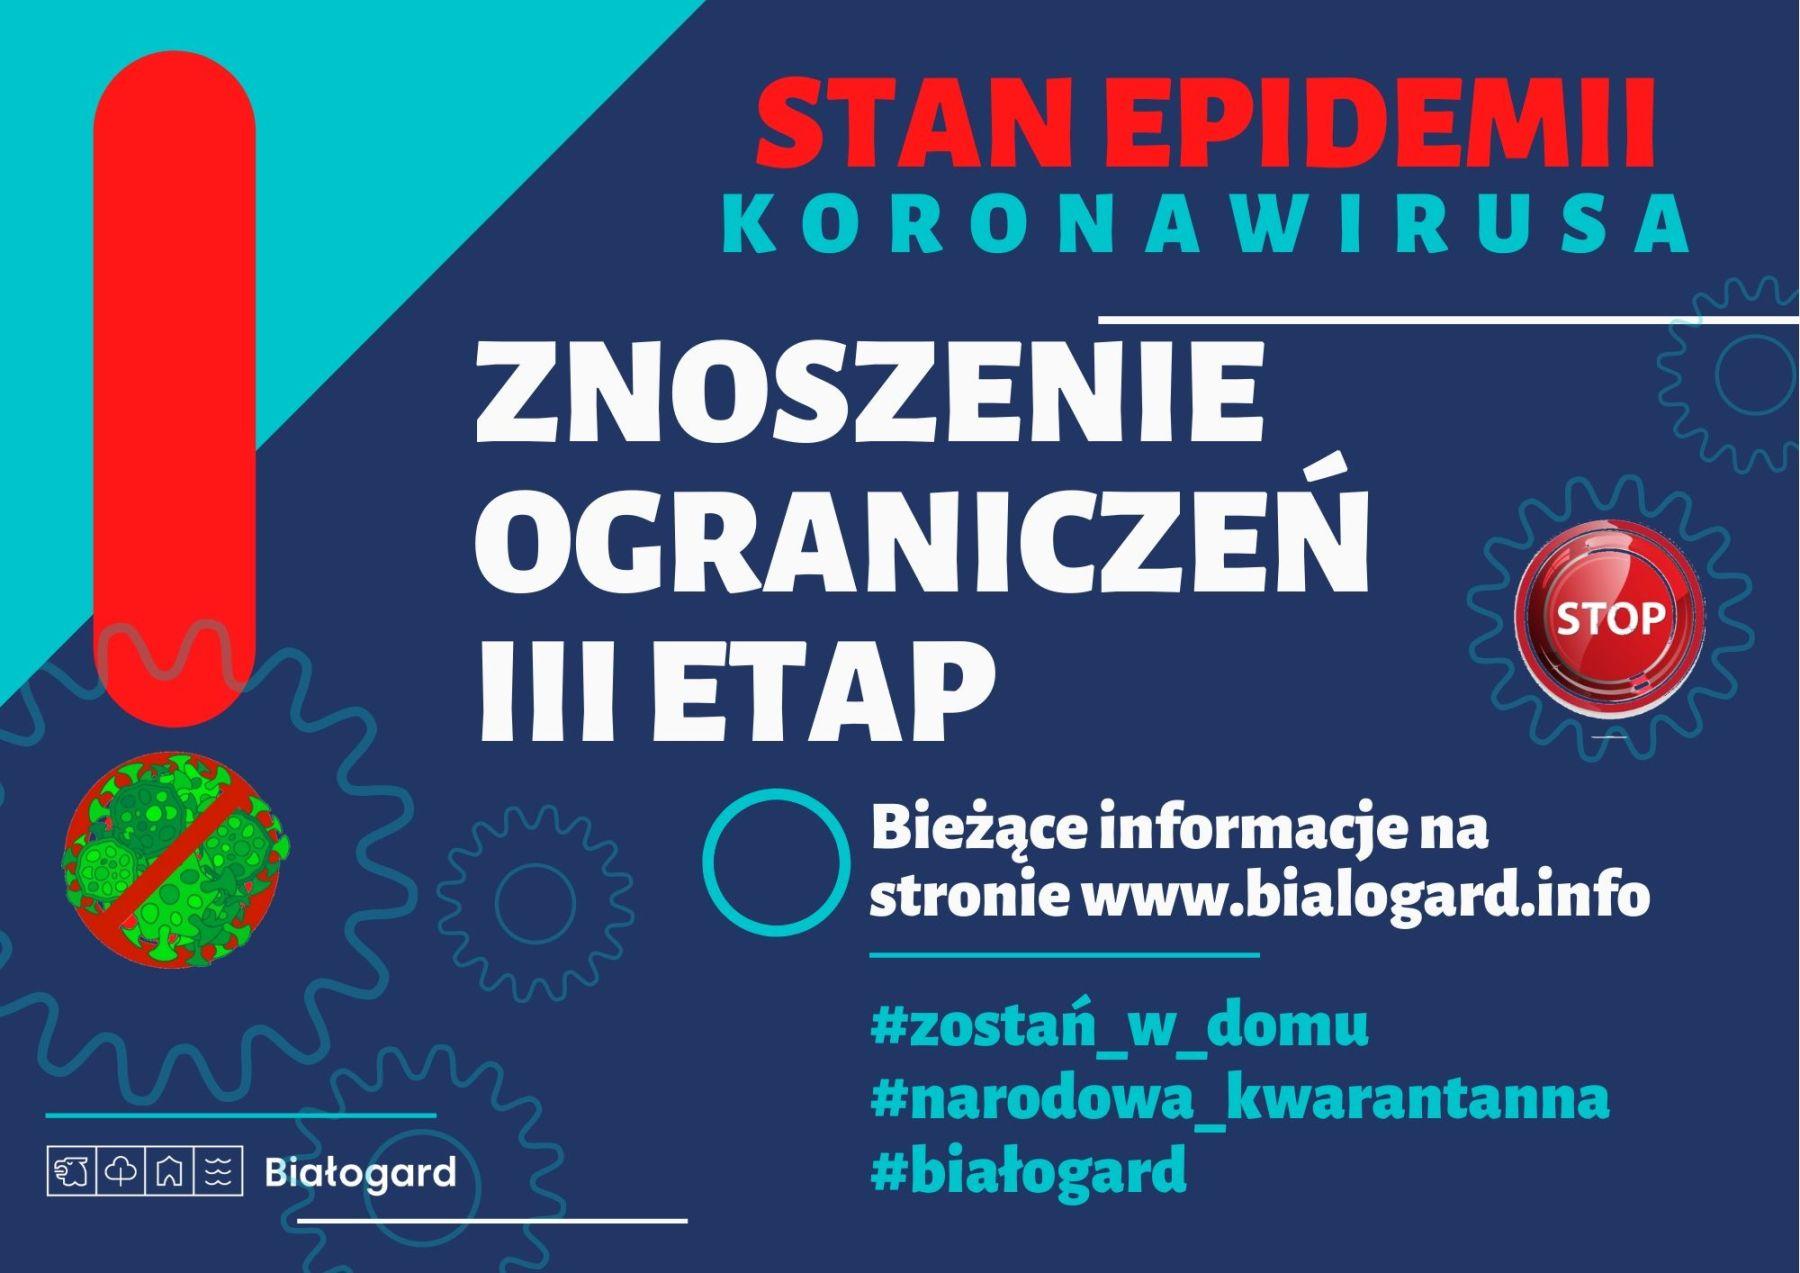 Stan epidemii. III etap znoszenia ograniczeń!, Miasto Białogard